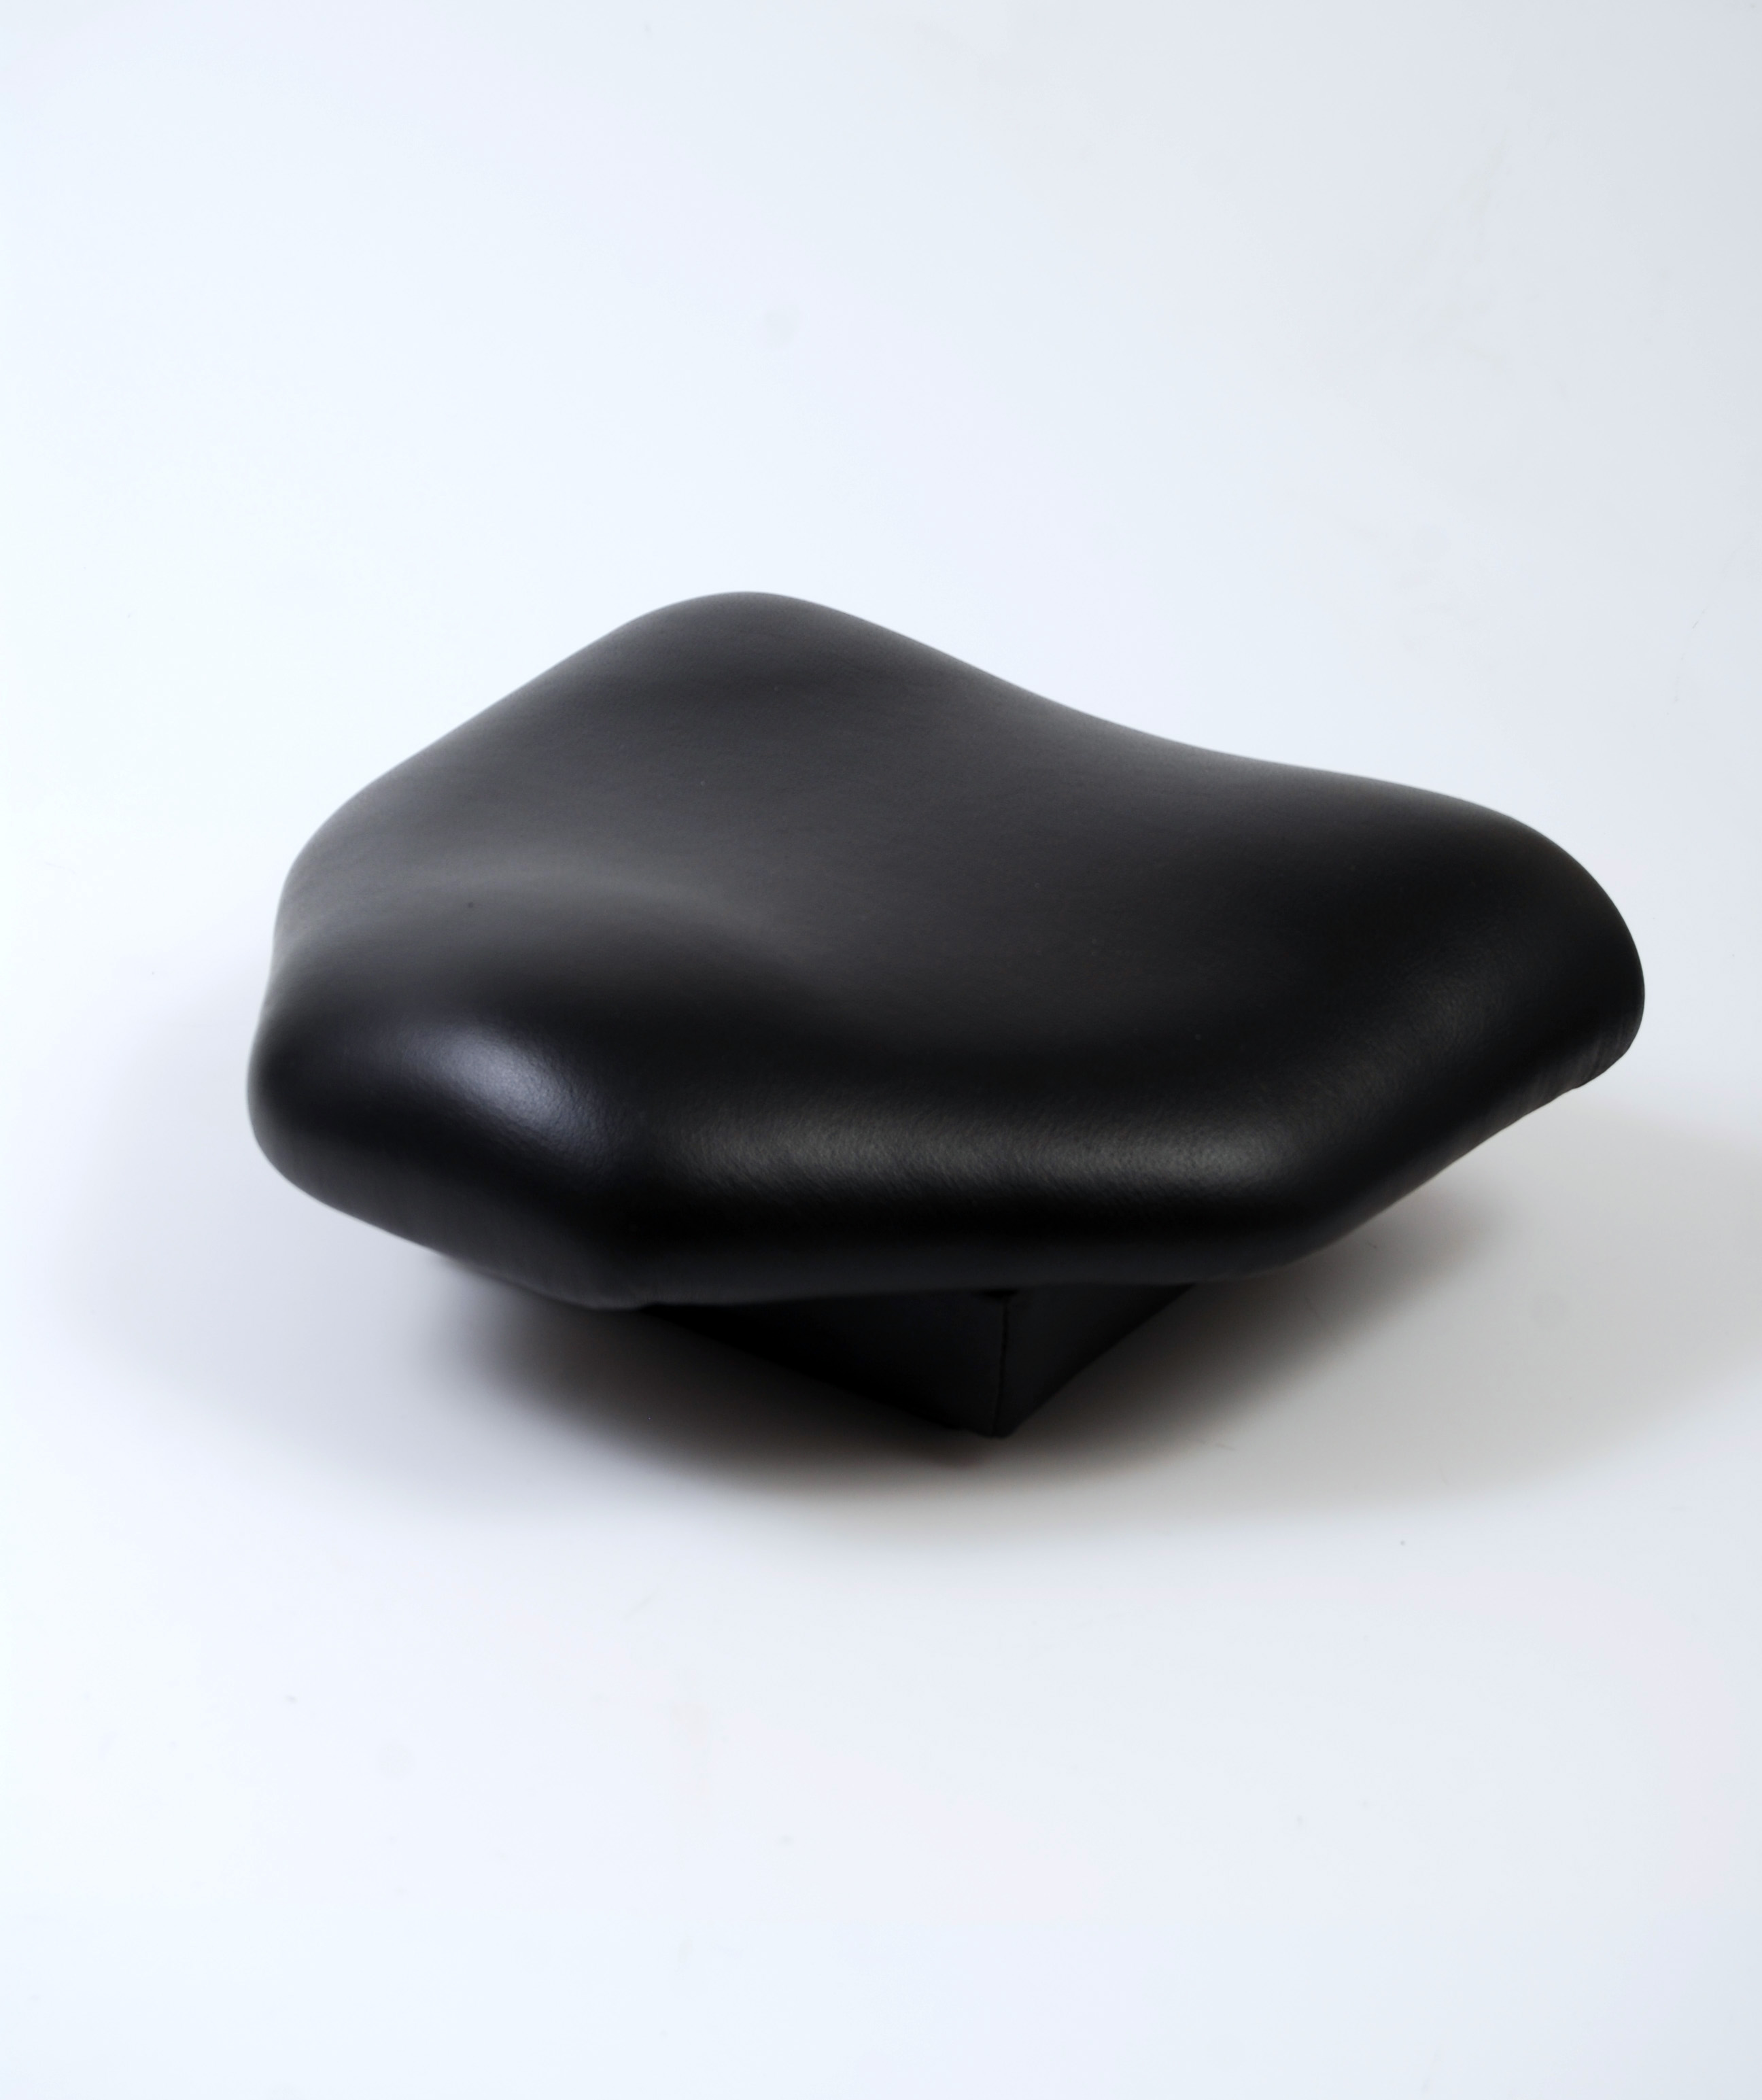 portable wobble chair exercises white folding covers ebay therapeutic the pettibon system